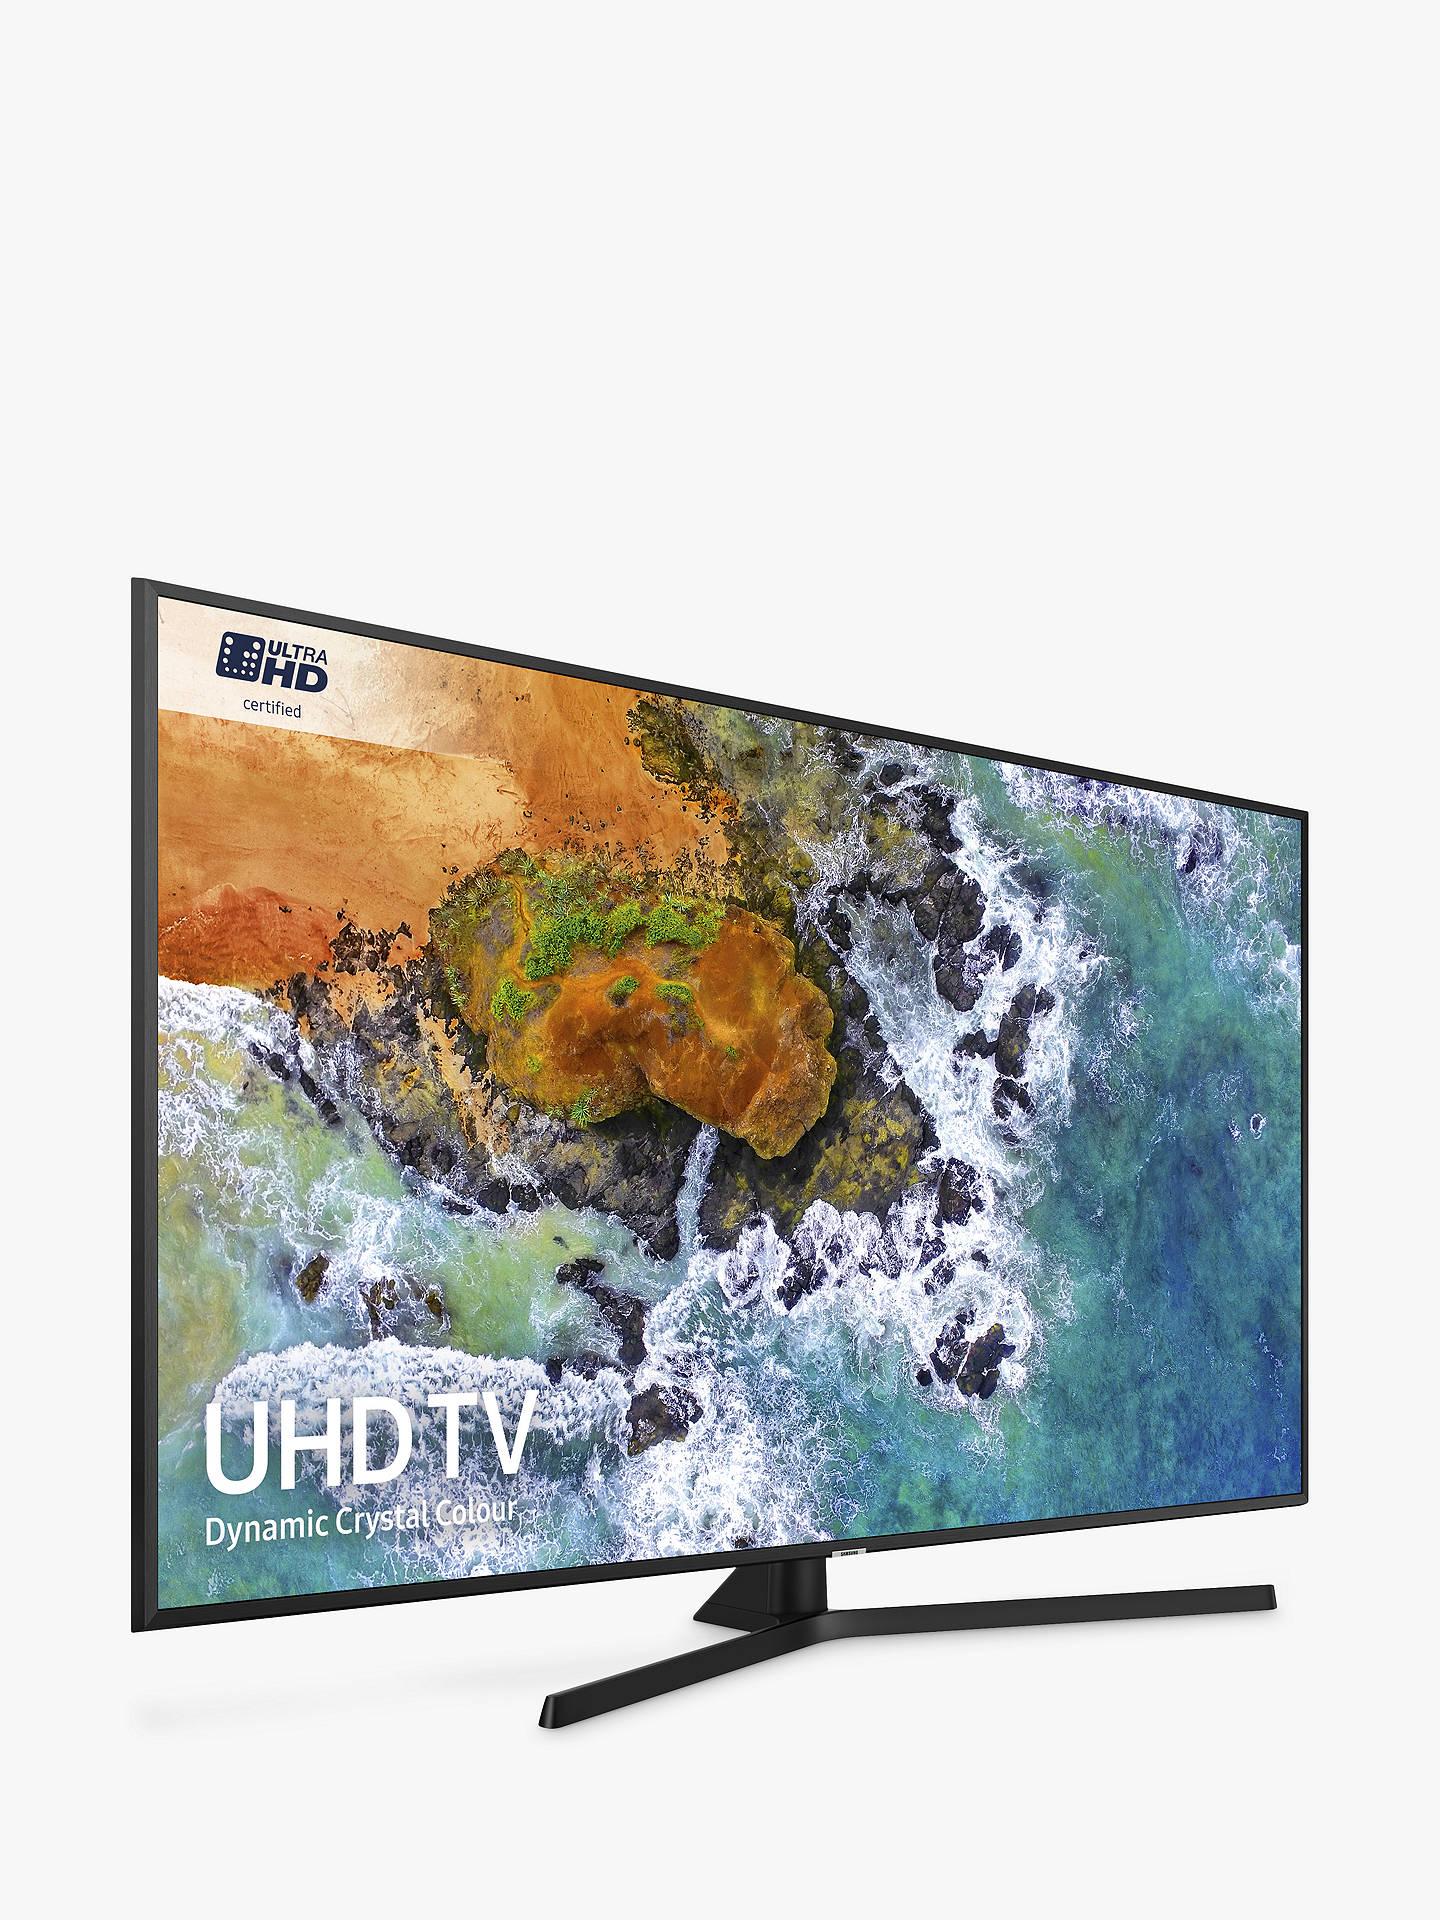 b86d1dcf730f ... Buy Samsung UE50NU7400 HDR 4K Ultra HD Smart TV